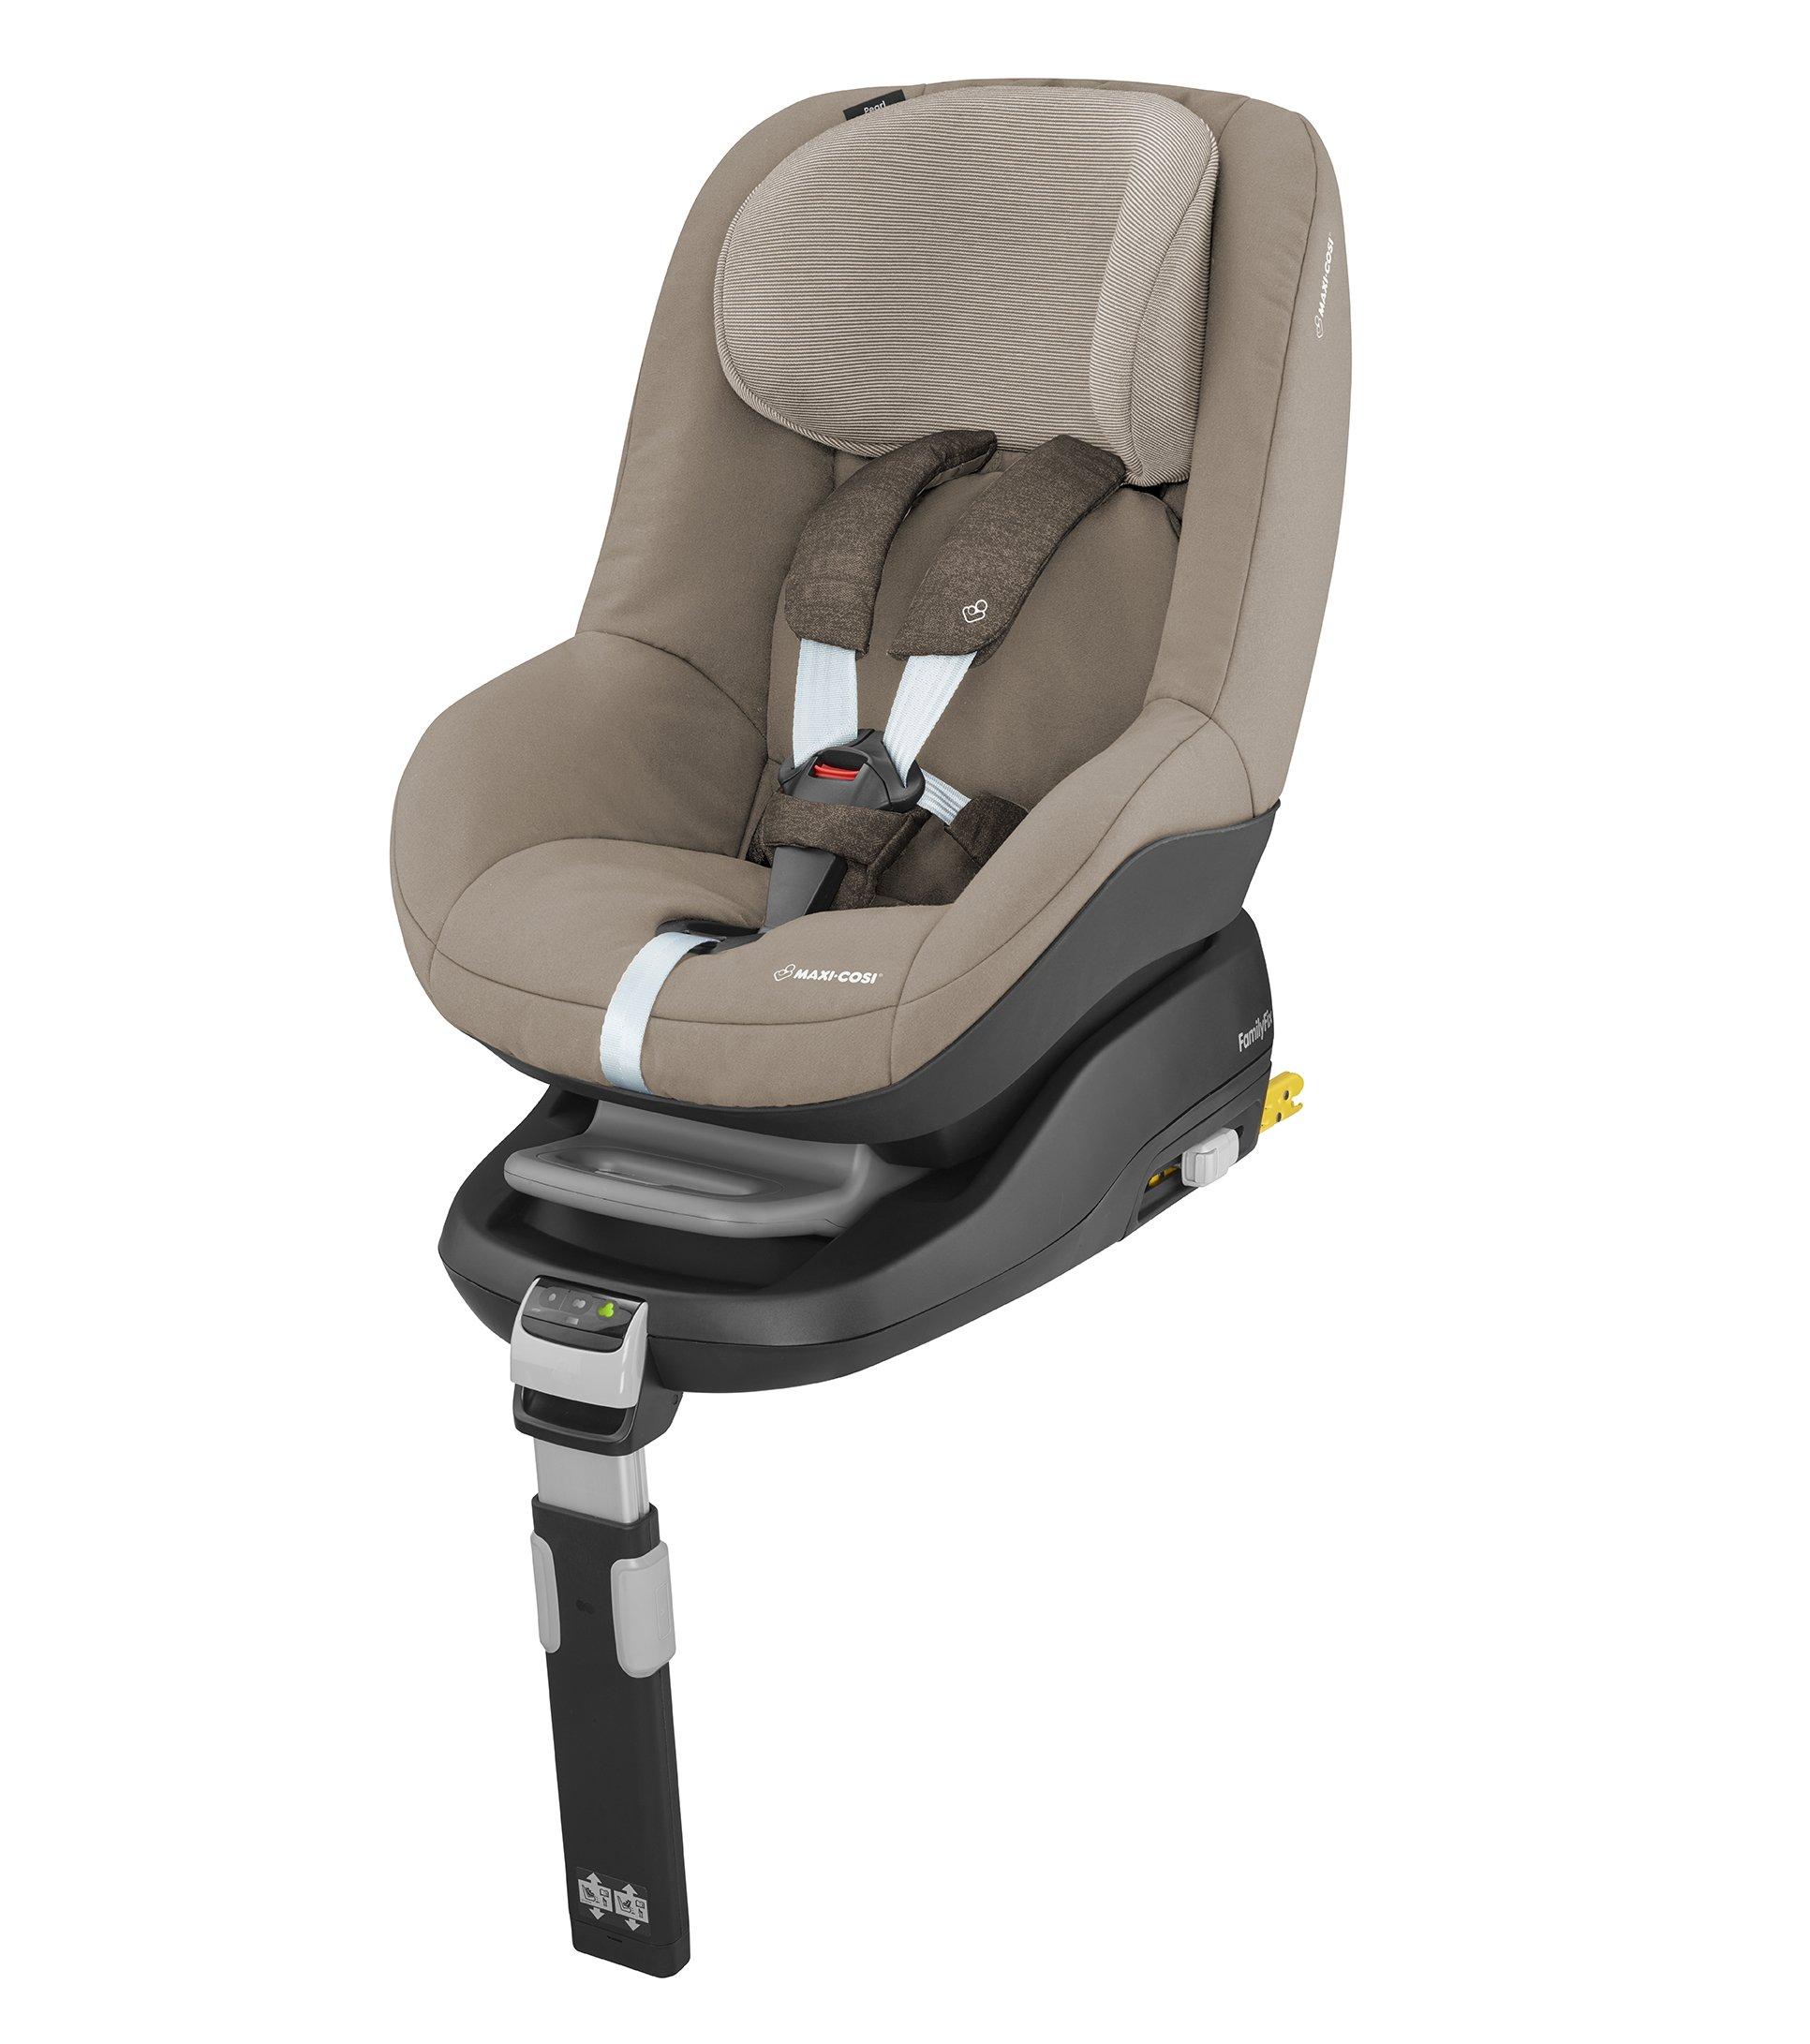 Maxi-Cosi 63409641Pearl Children's Seat, Group 1, 9-18kg Maxi-Cosi  100